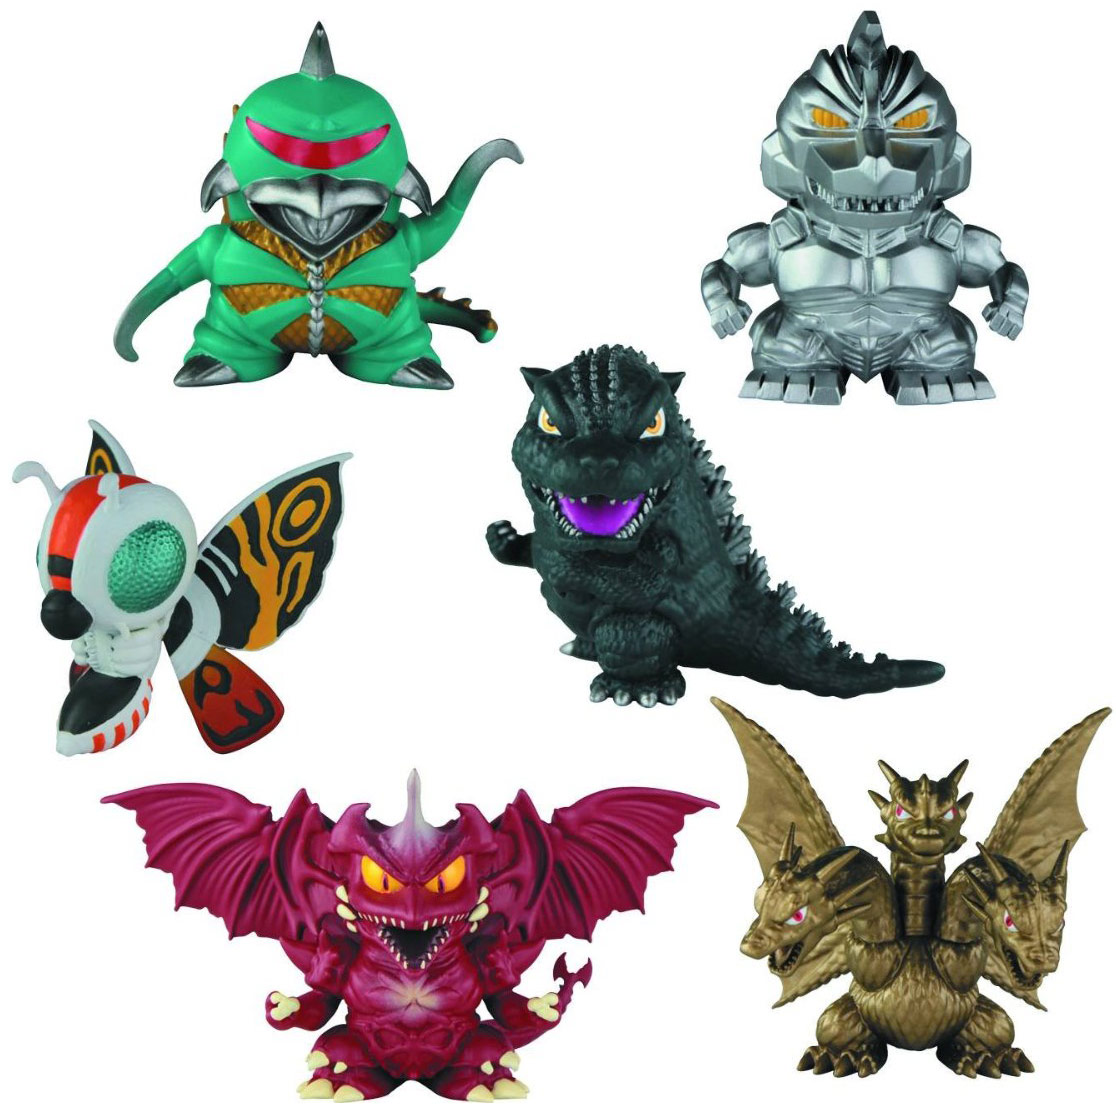 Godzilla Chibi Super Deformed Mini Figure 6 Pack